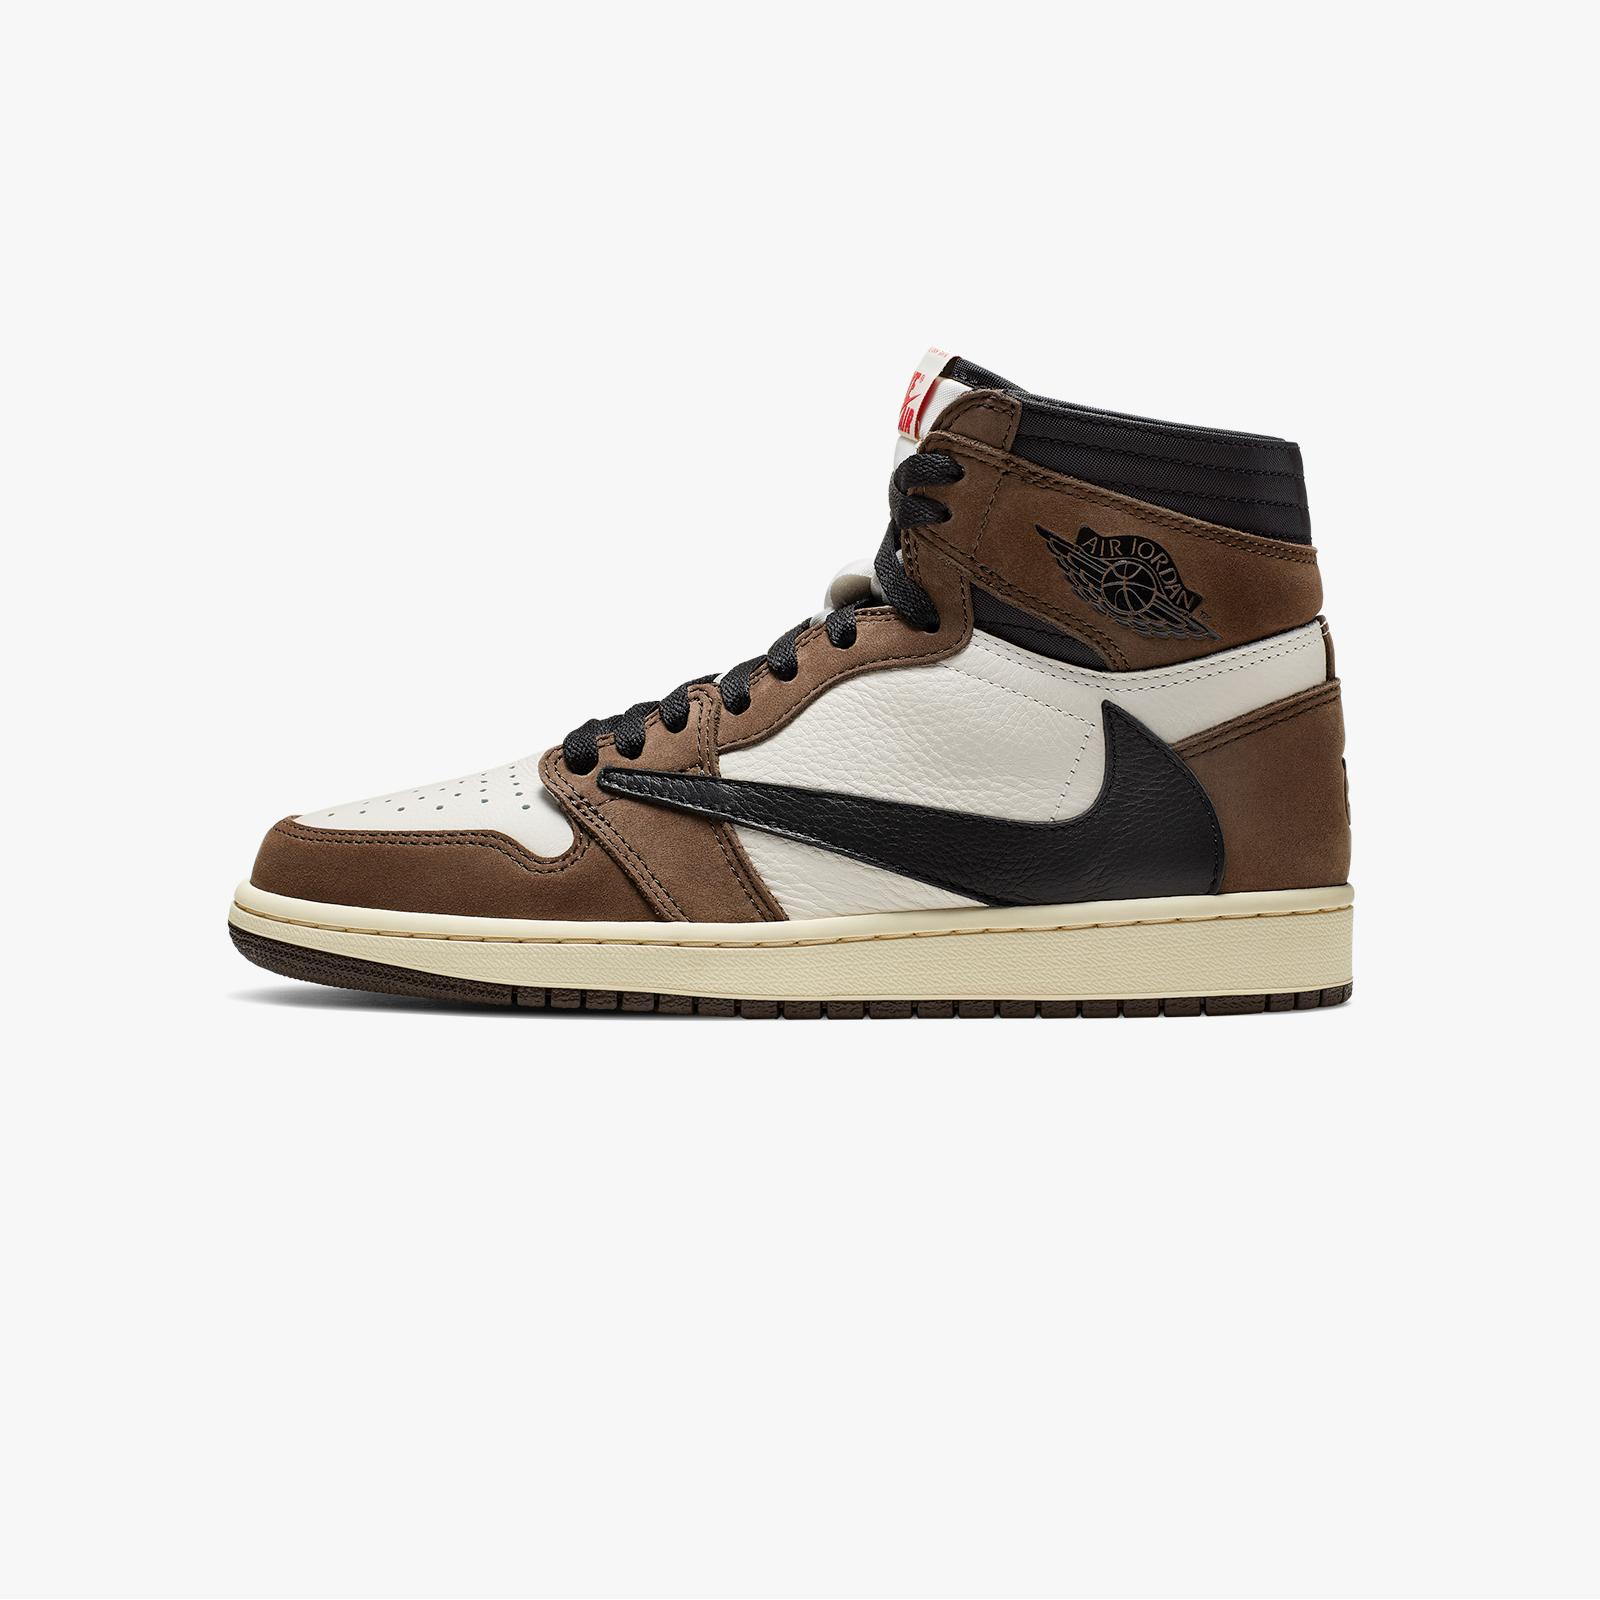 230e8621ca03 Jordan Brand Air Jordan 1 High OG Travis Scott SP - Cd4487-100 -  Sneakersnstuff